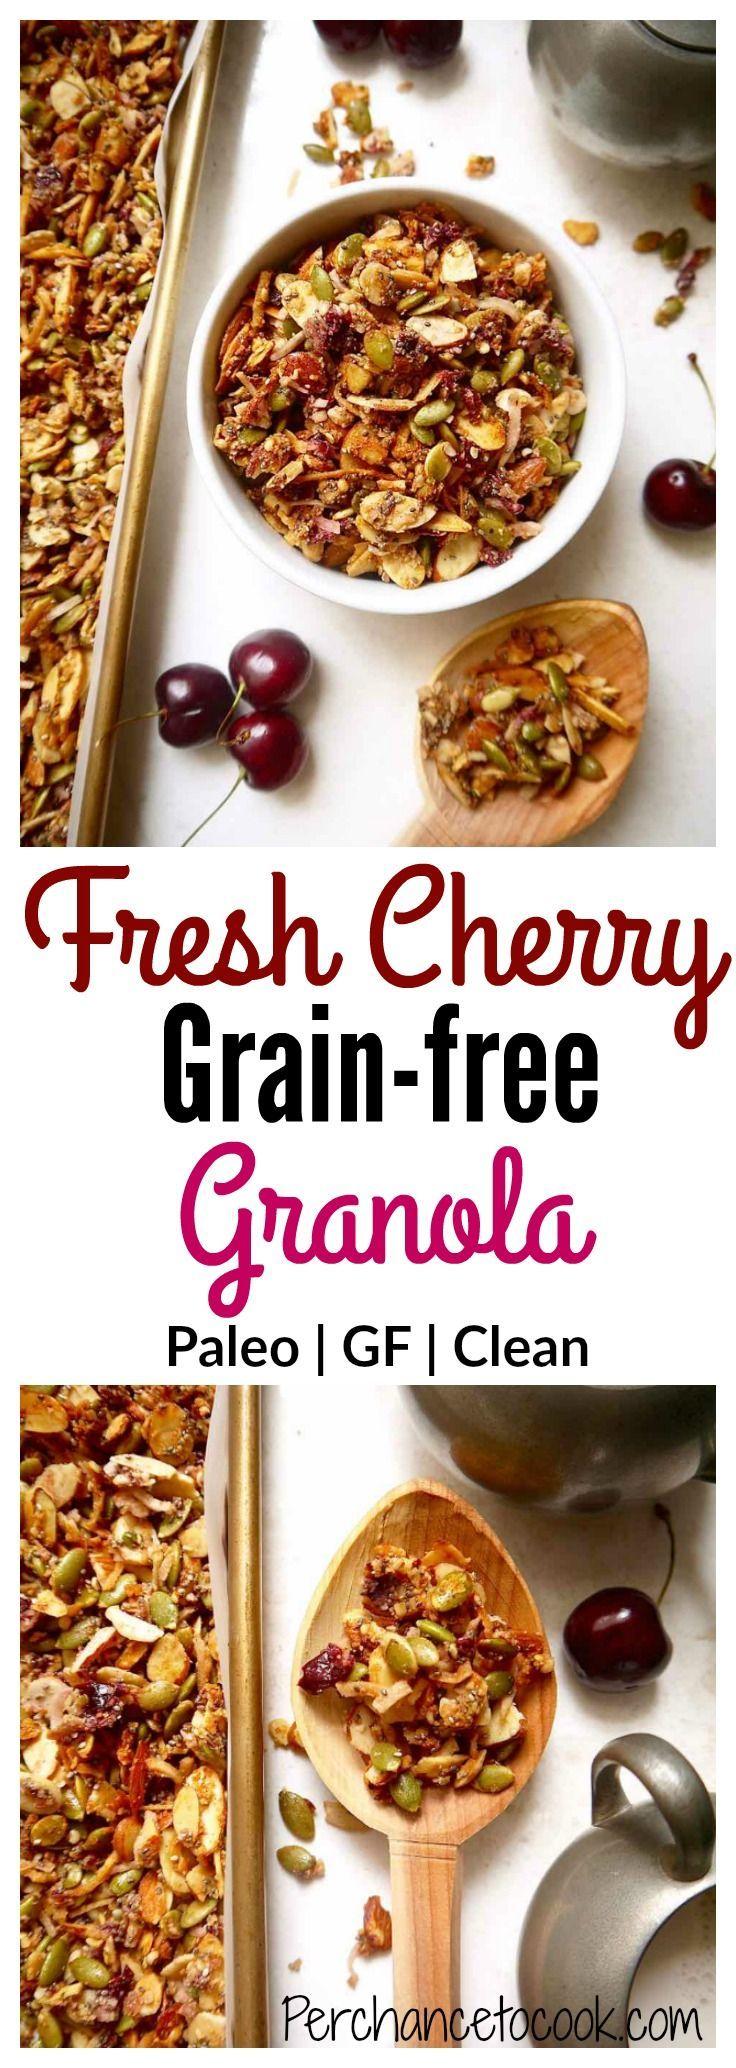 Fresh cherry grainfree granola paleo gf perchance to